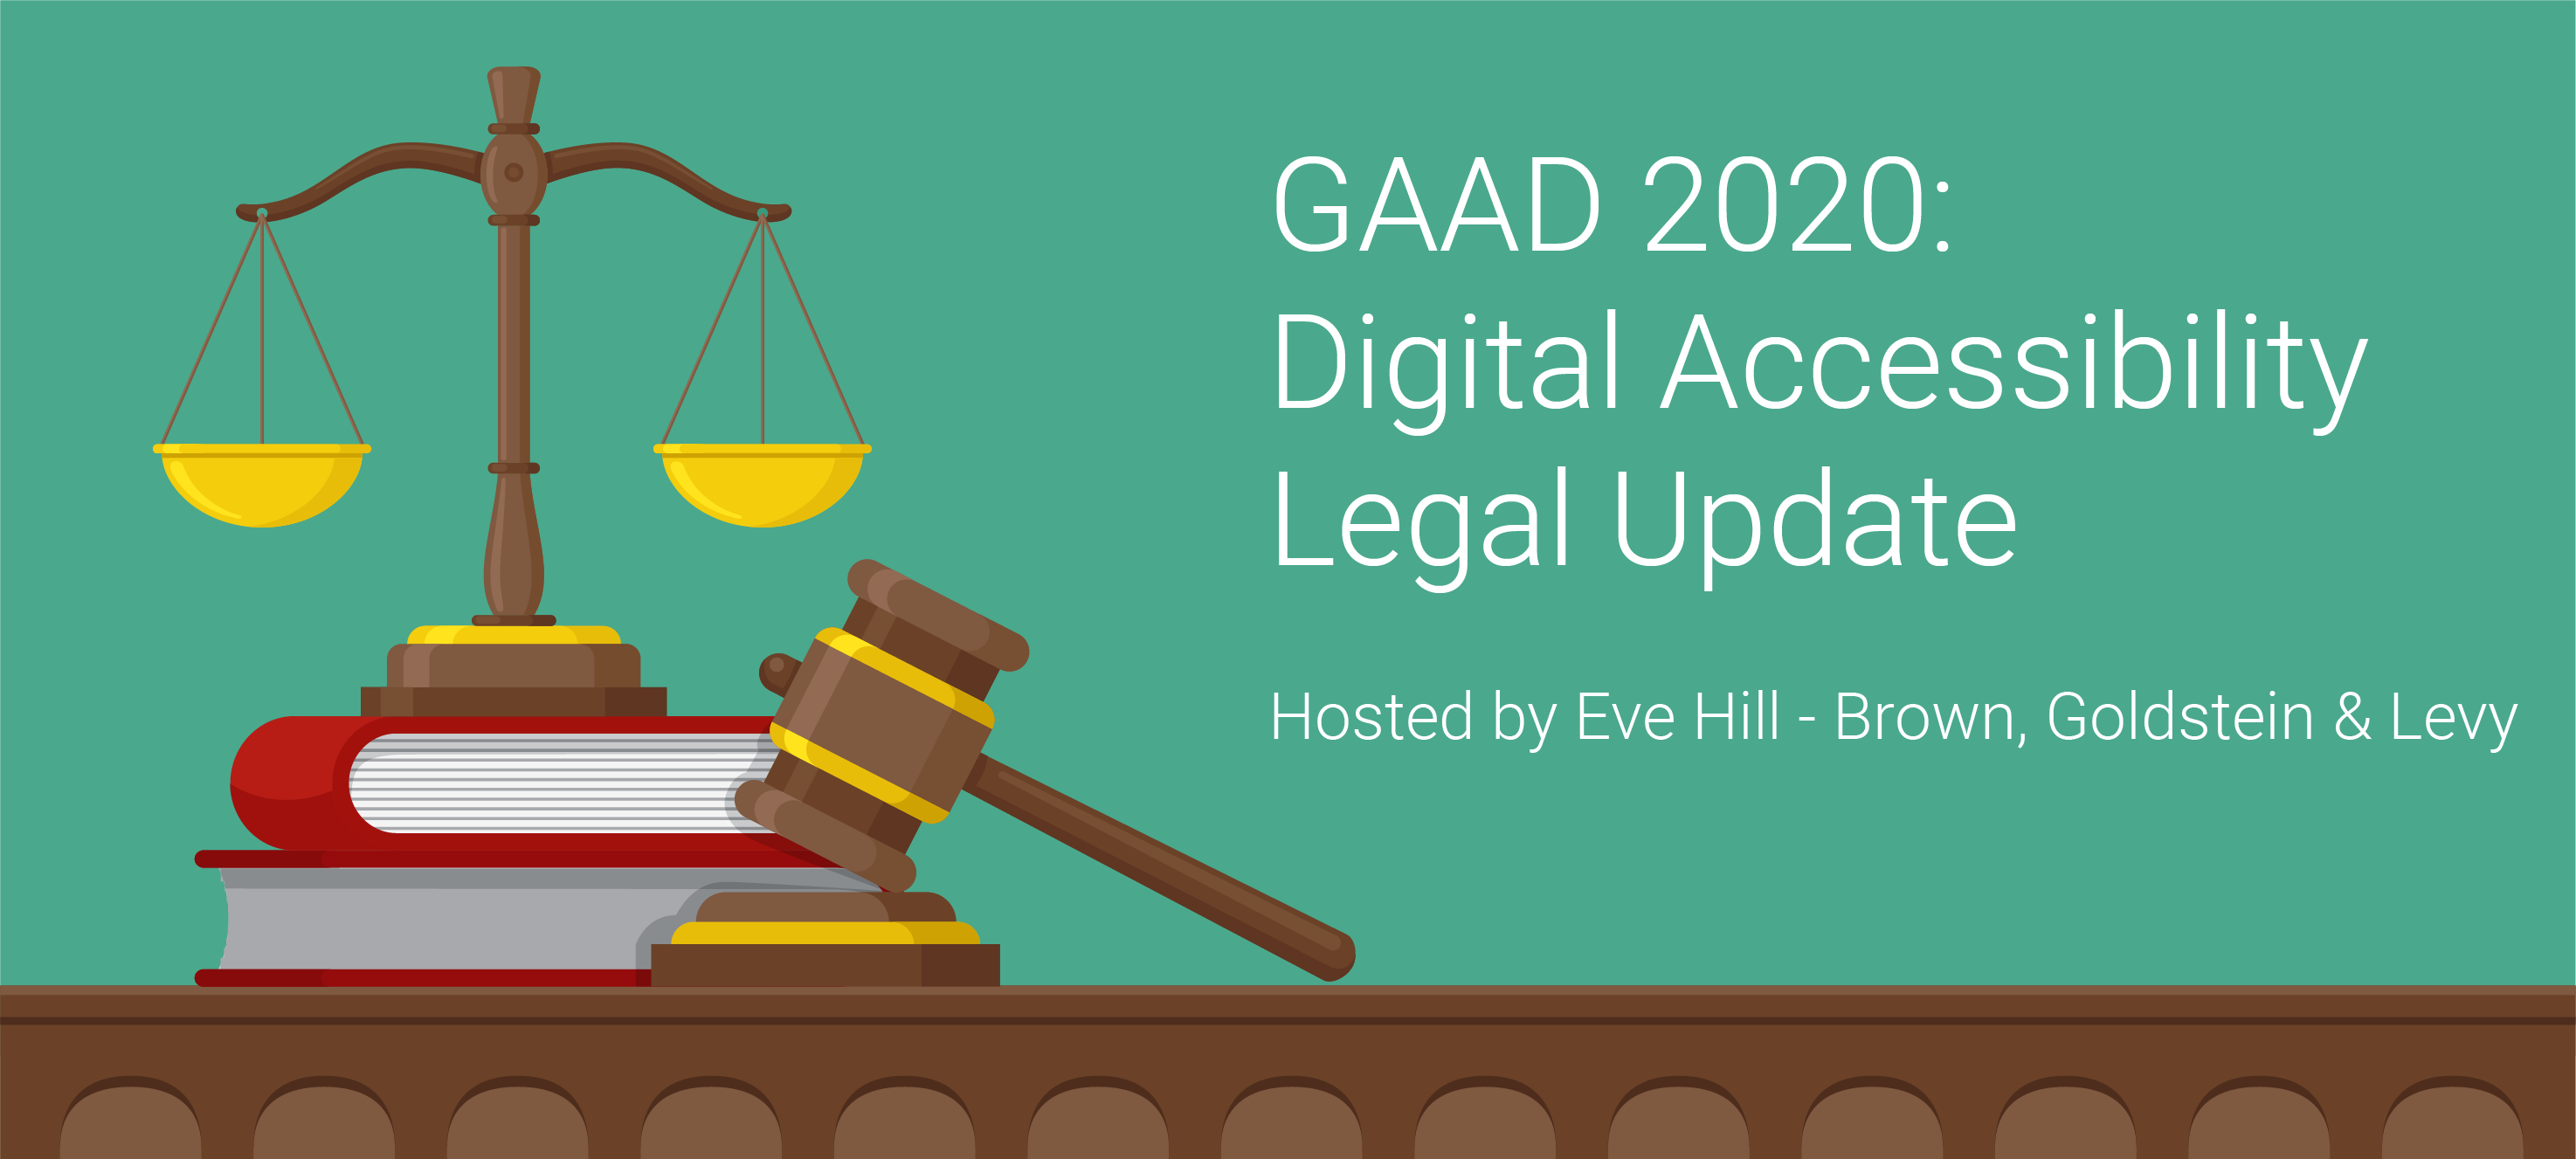 Legal Webinar - Eve Hill